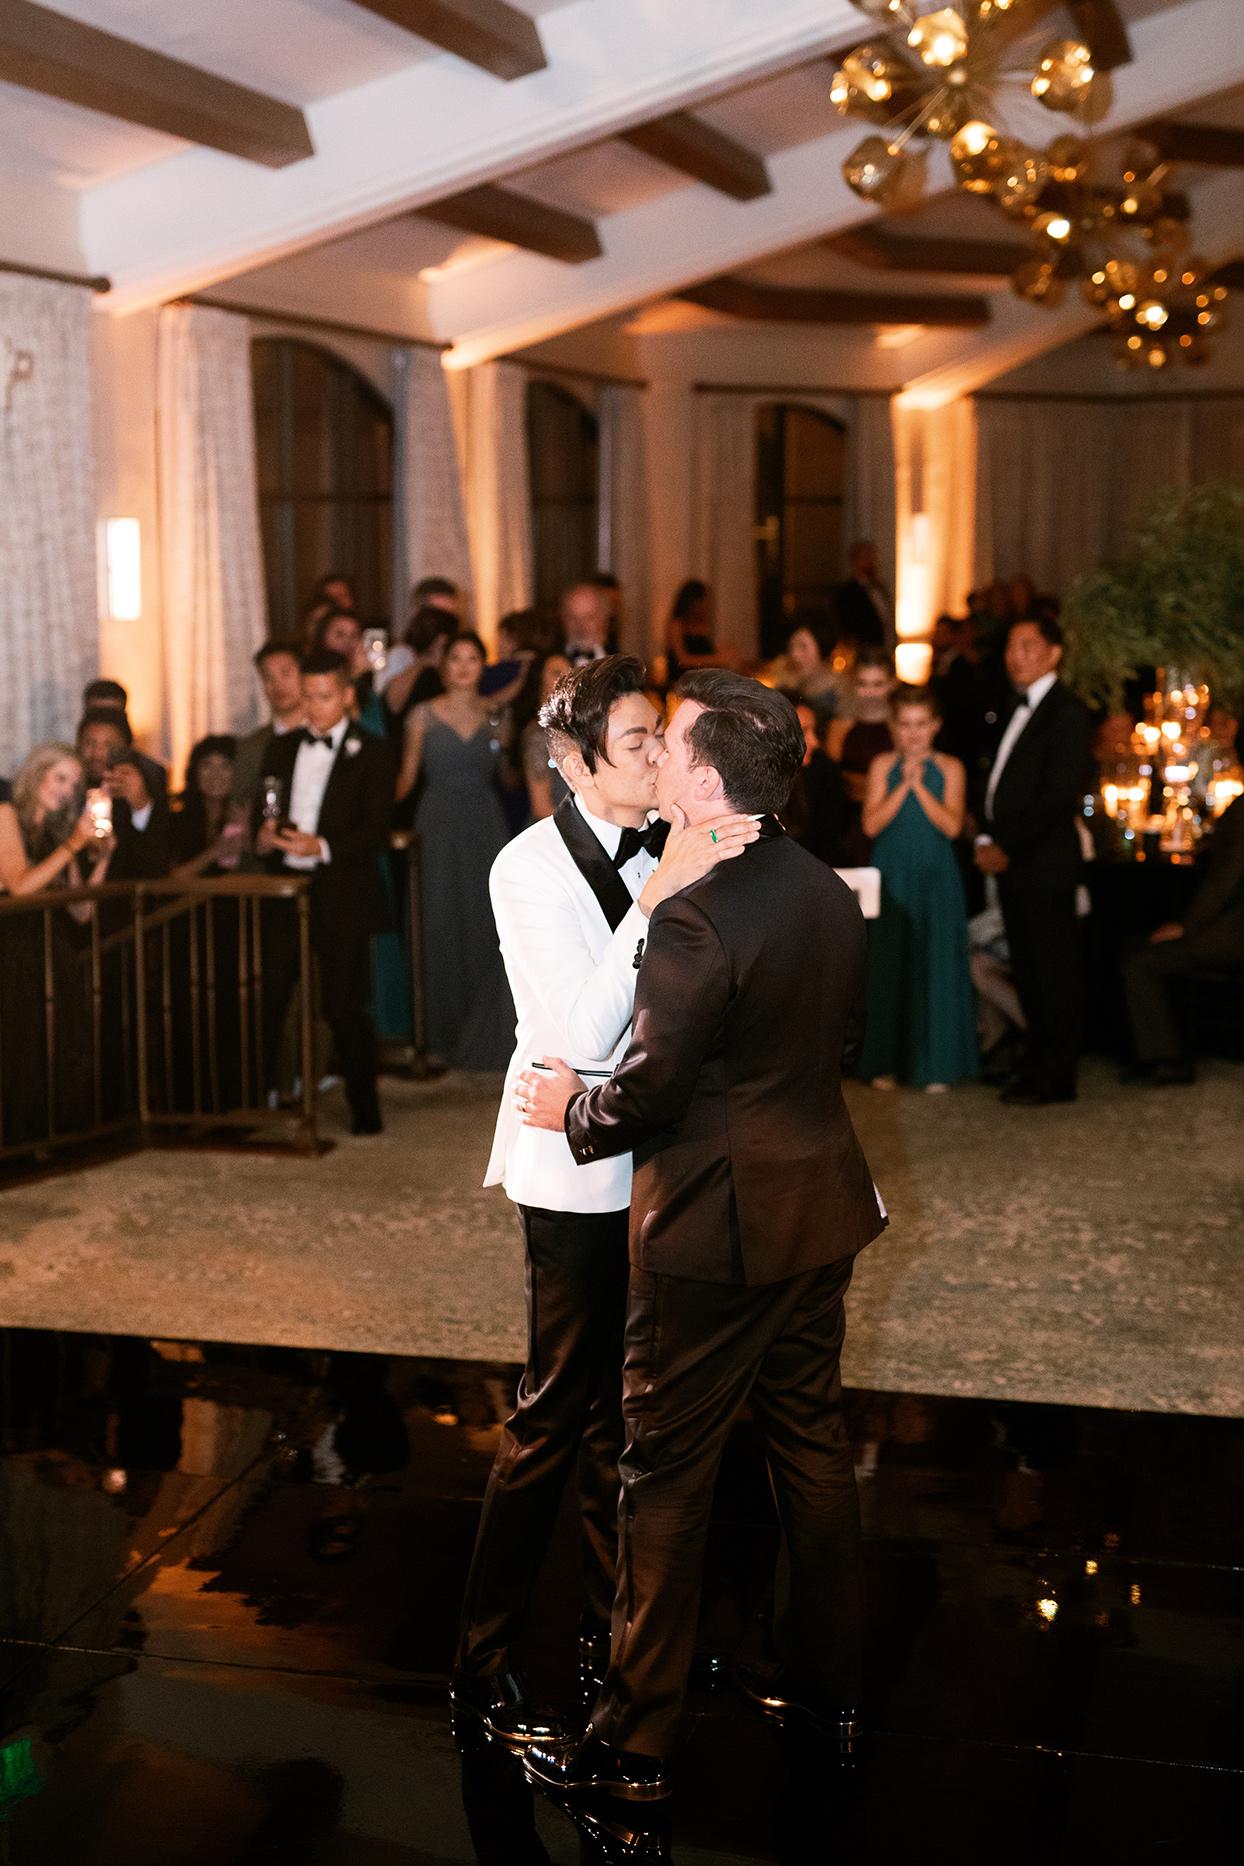 jason justin wedding reception first dance kiss